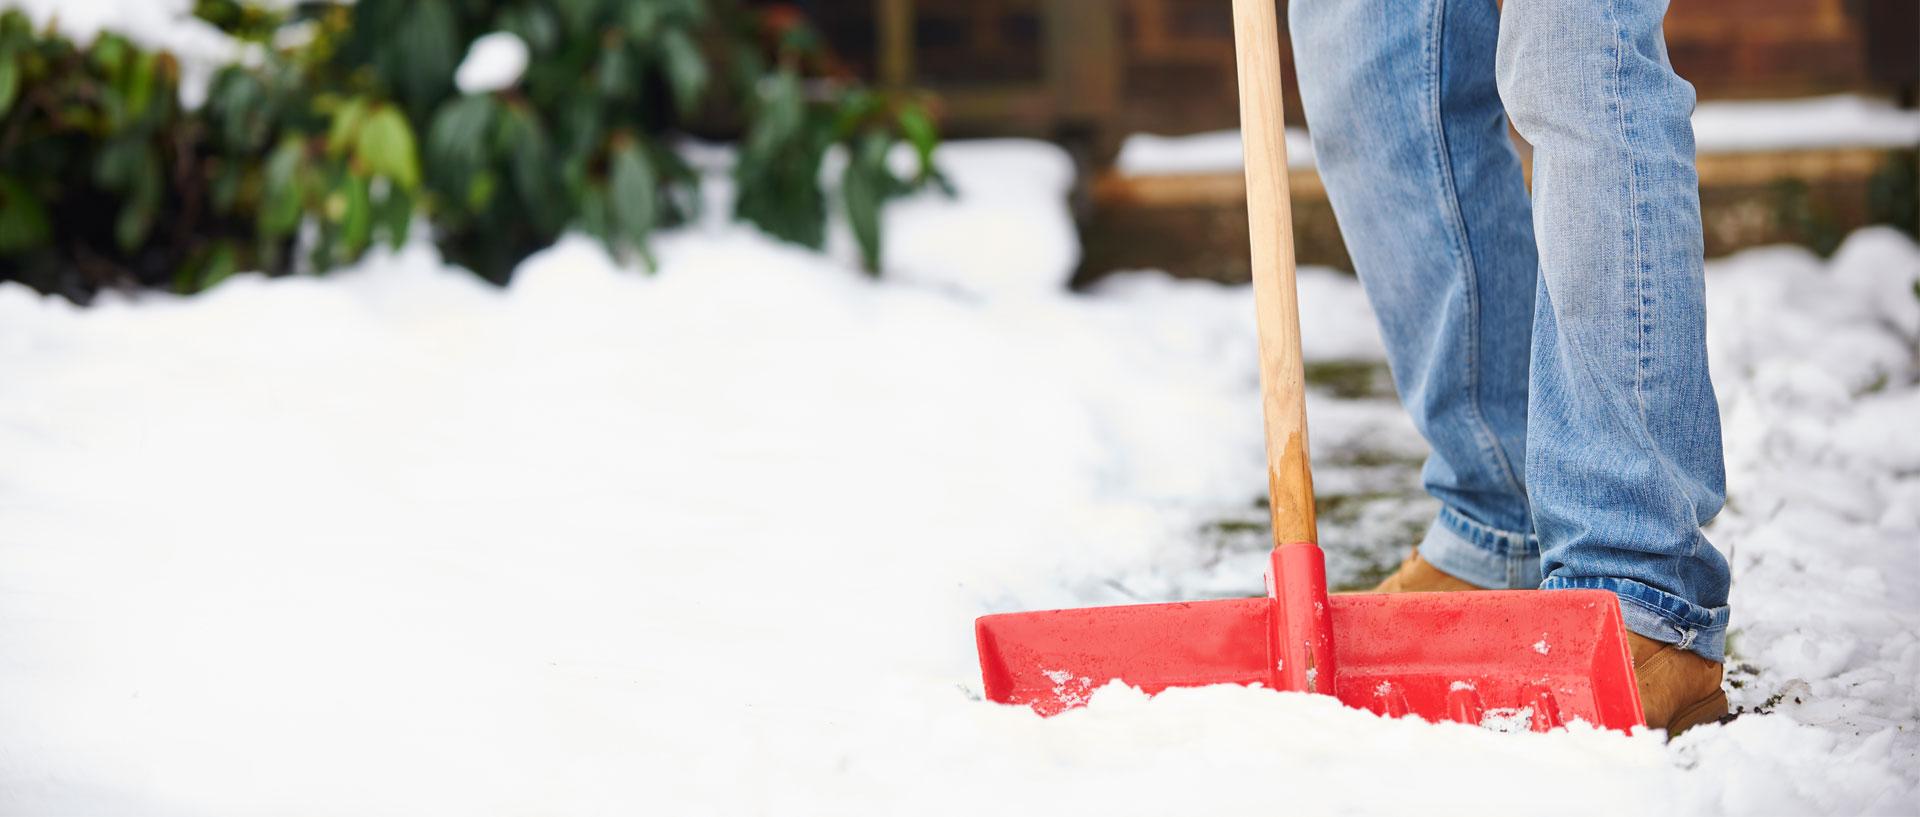 New Twist On An Ergonomic Snow Shovel Consumer Reports